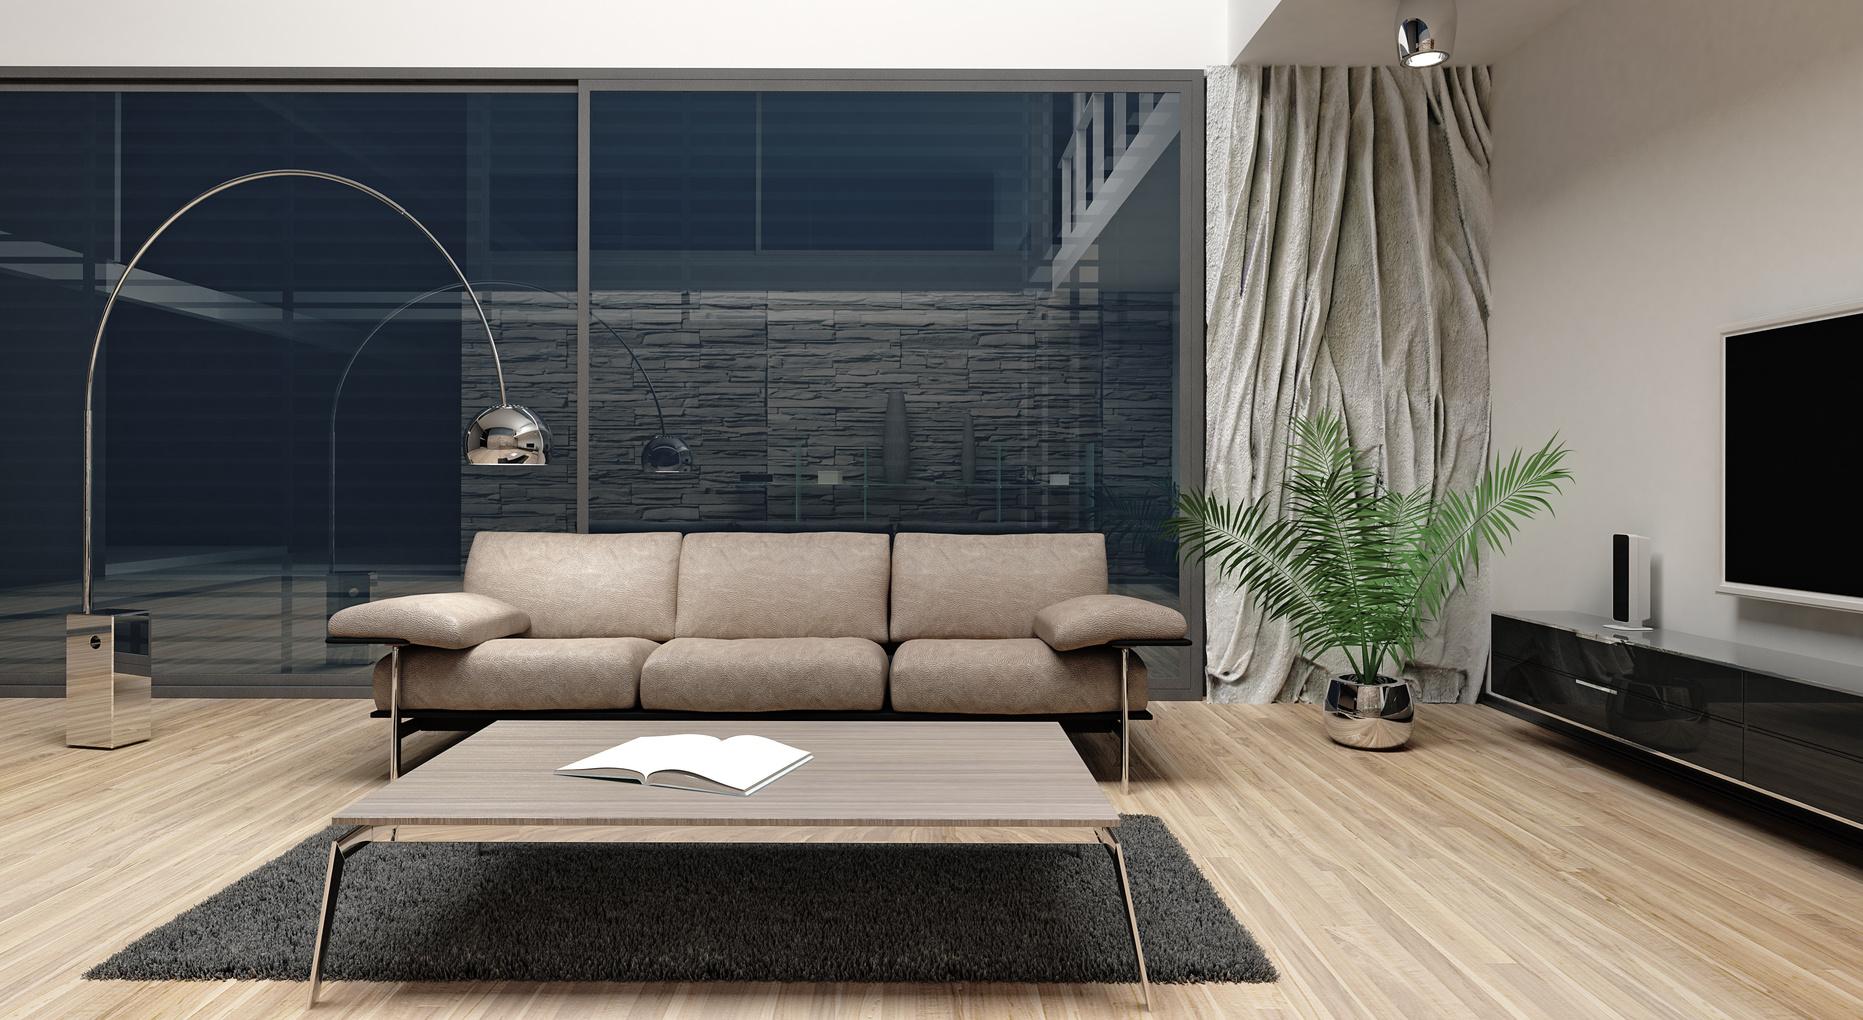 Luxury vinyl plank (LVP) flooring in The Colony, TX from Home Floors